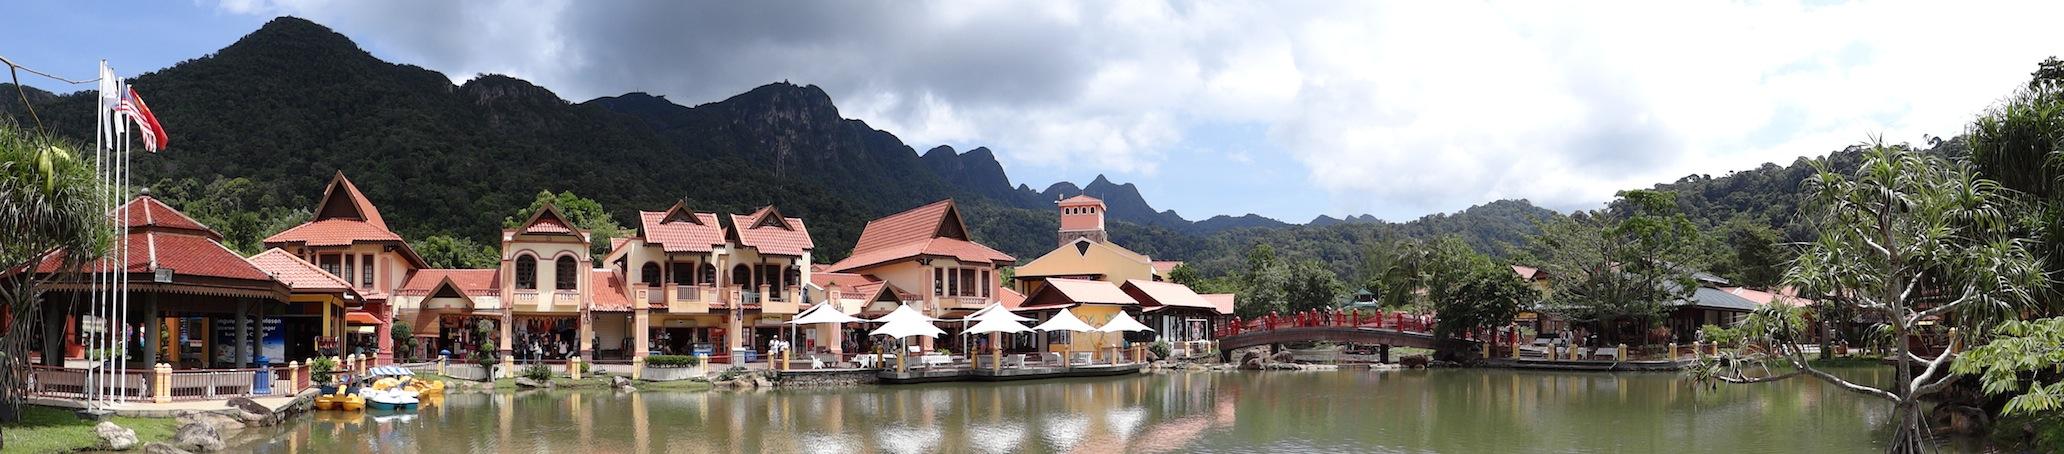 33 Panorama Oriental Village